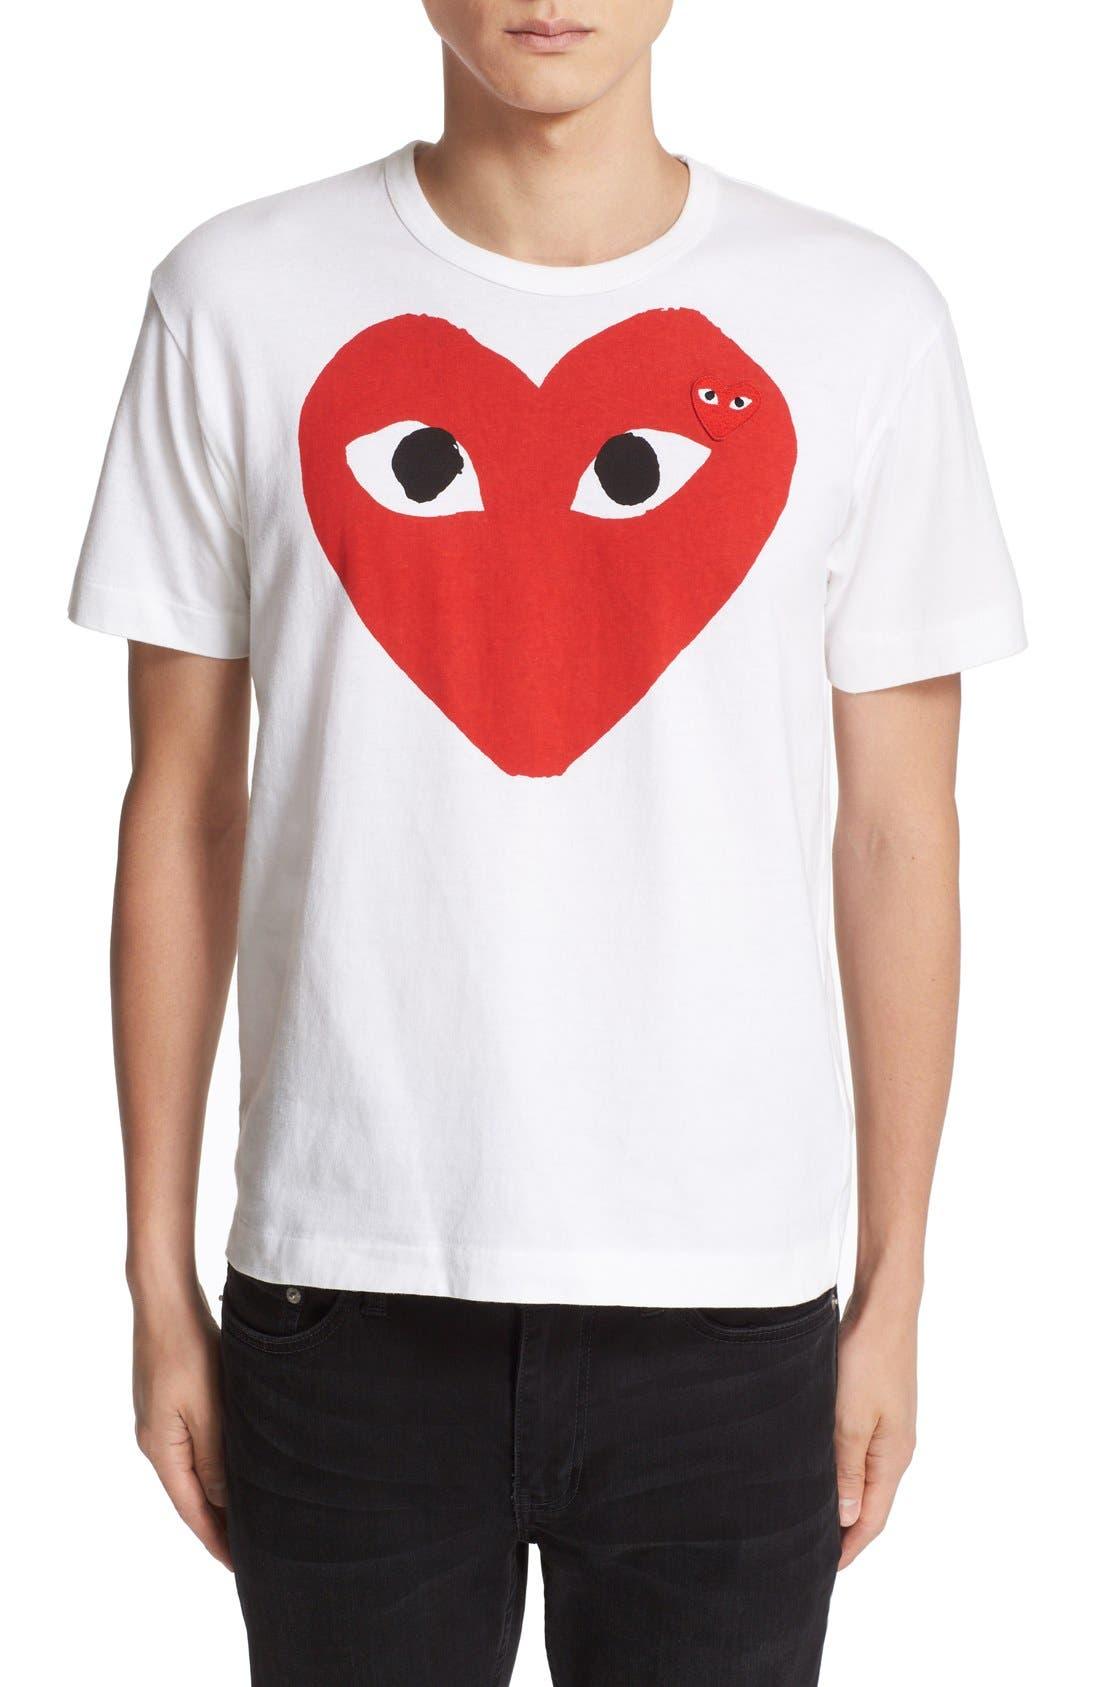 Heart Face Graphic T Shirt